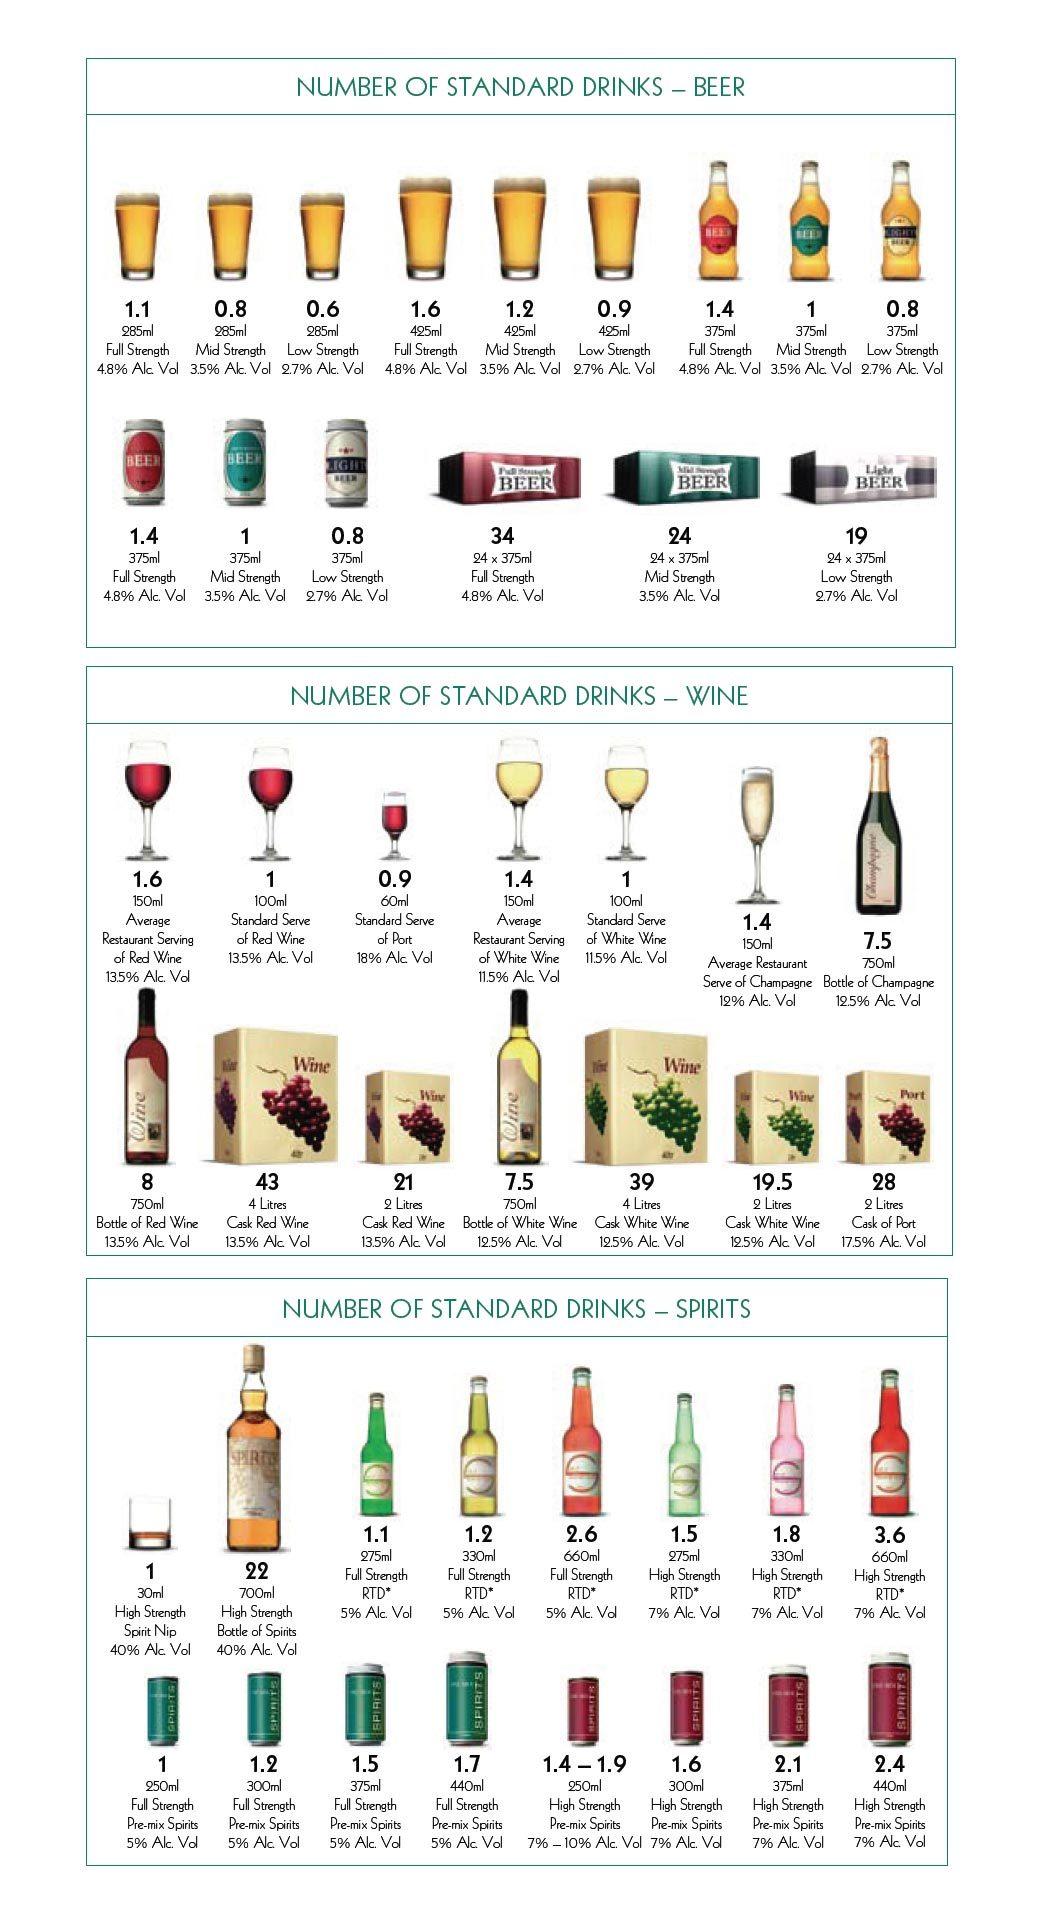 standard-drinks-australia